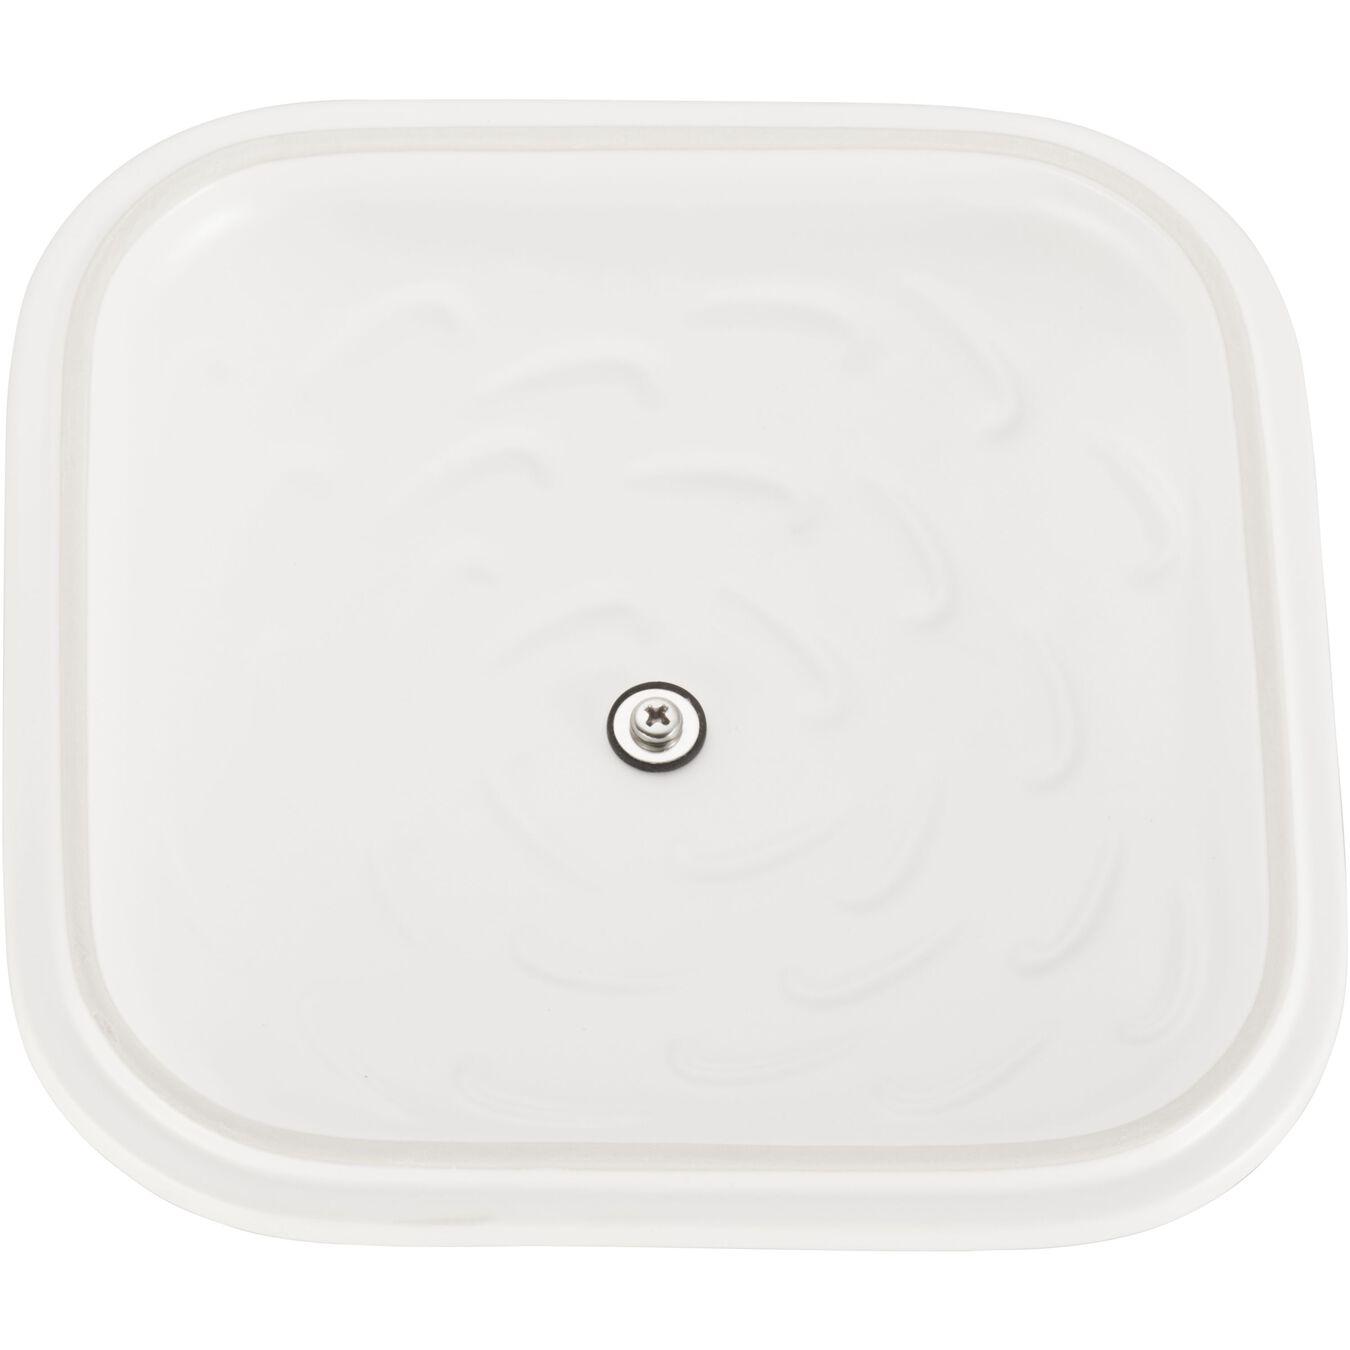 Ceramic square Special shape bakeware, matte-white,,large 5